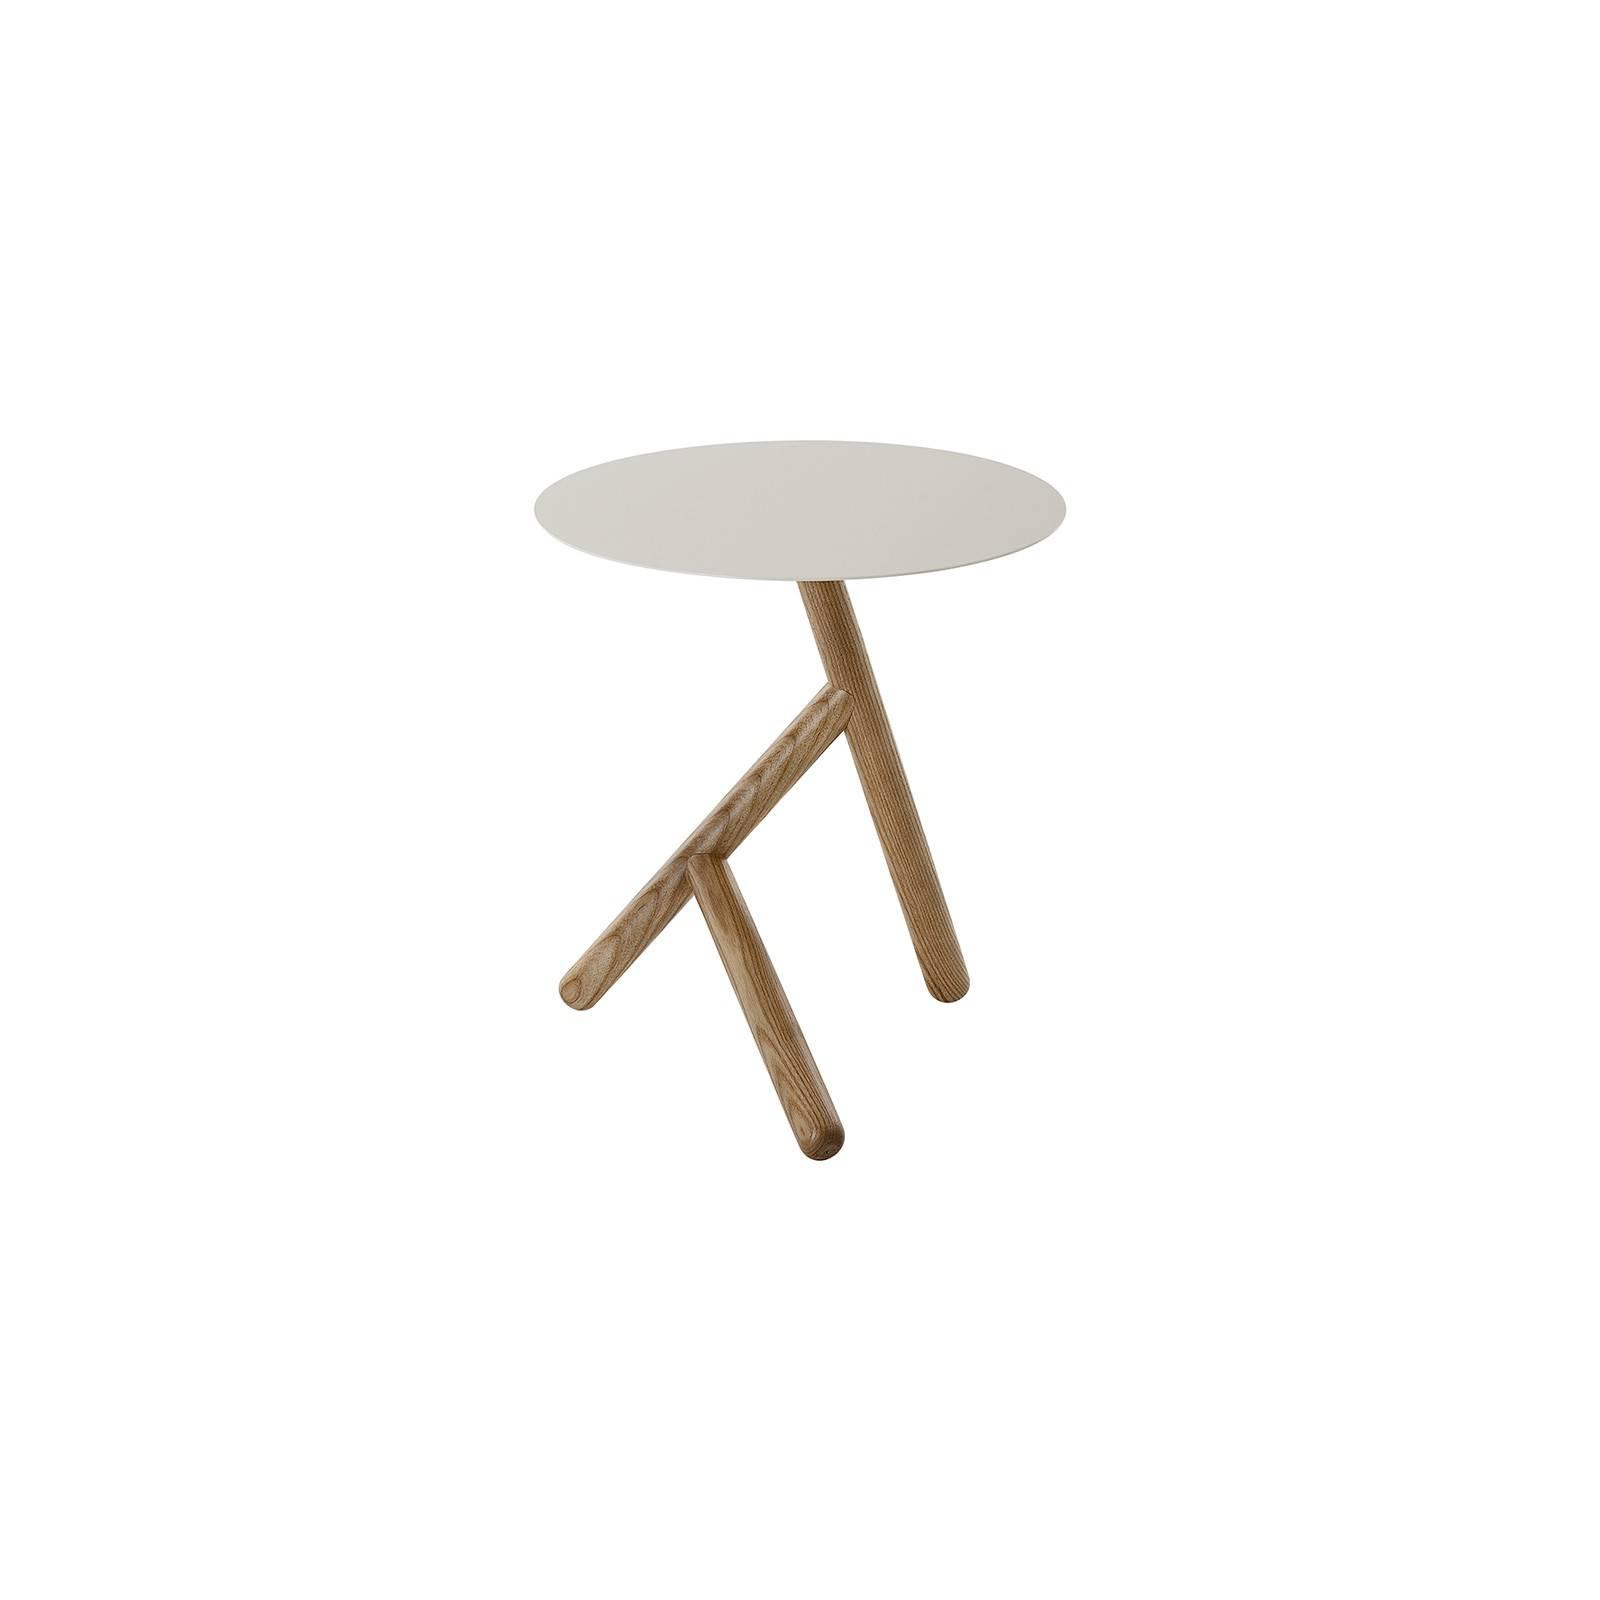 Table basse tripode en frêne massif. Modèle de designer Basile.